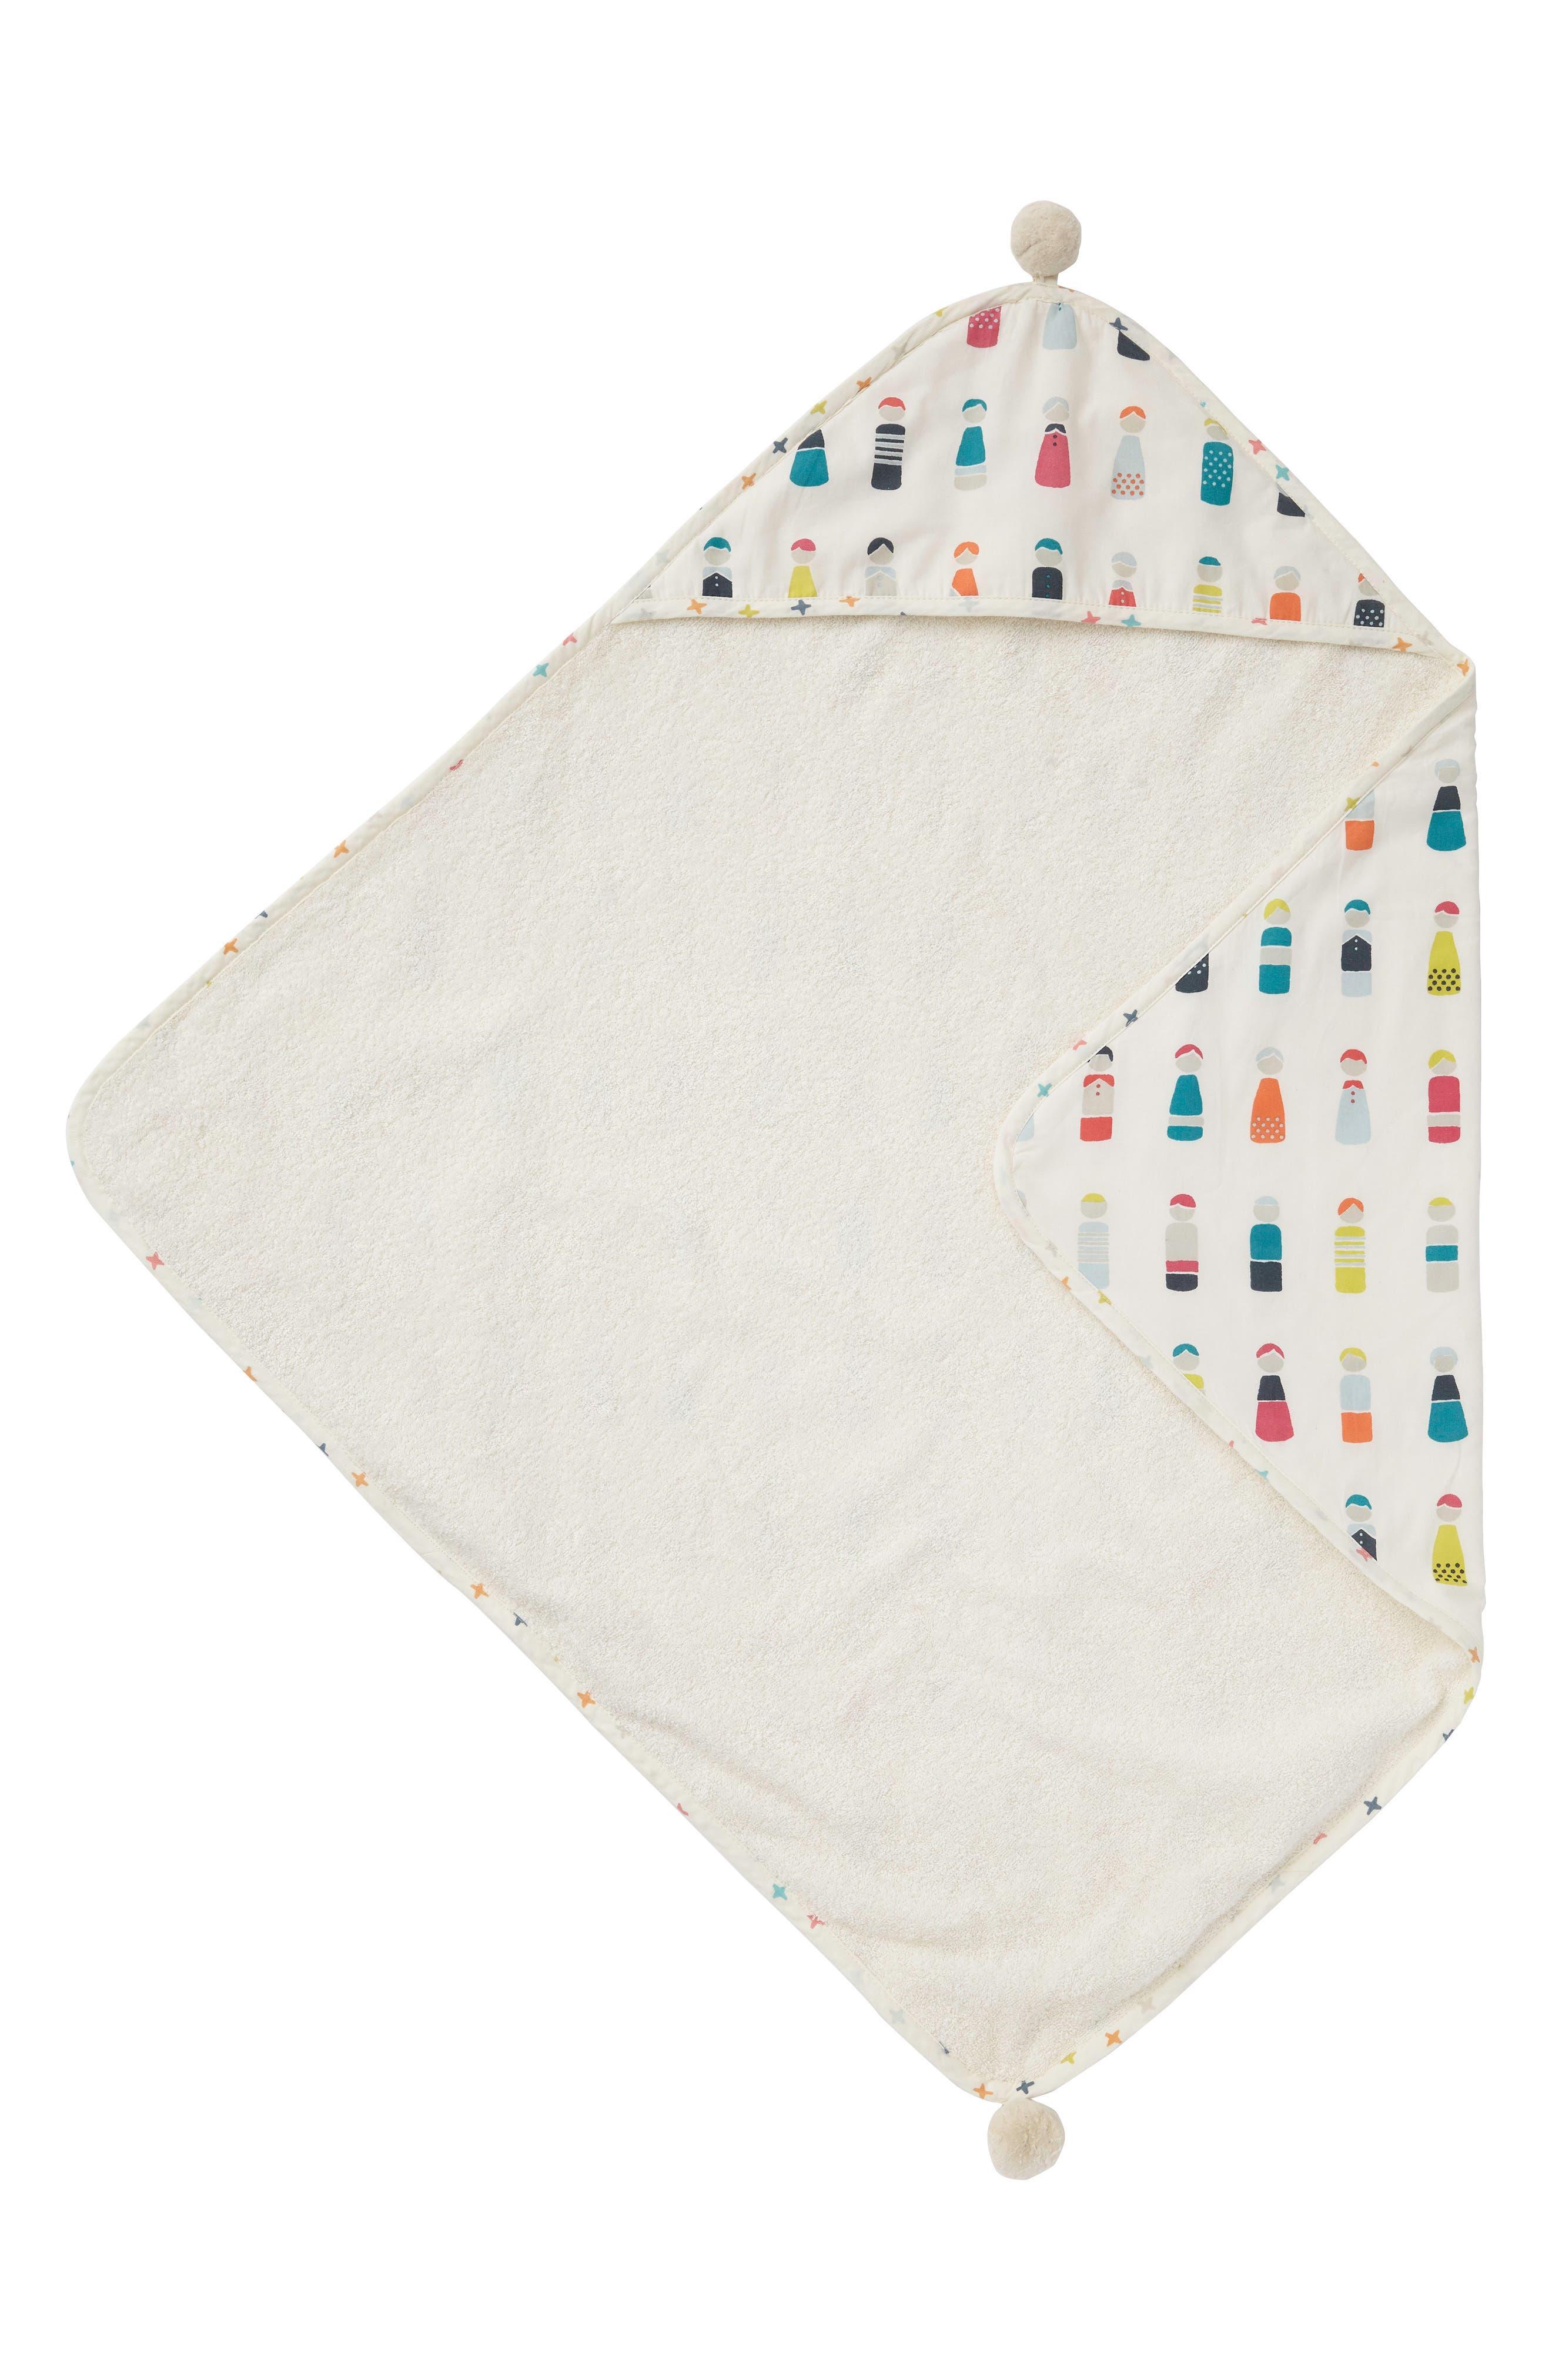 Little Peeps Print Hooded Towel,                         Main,                         color, 100